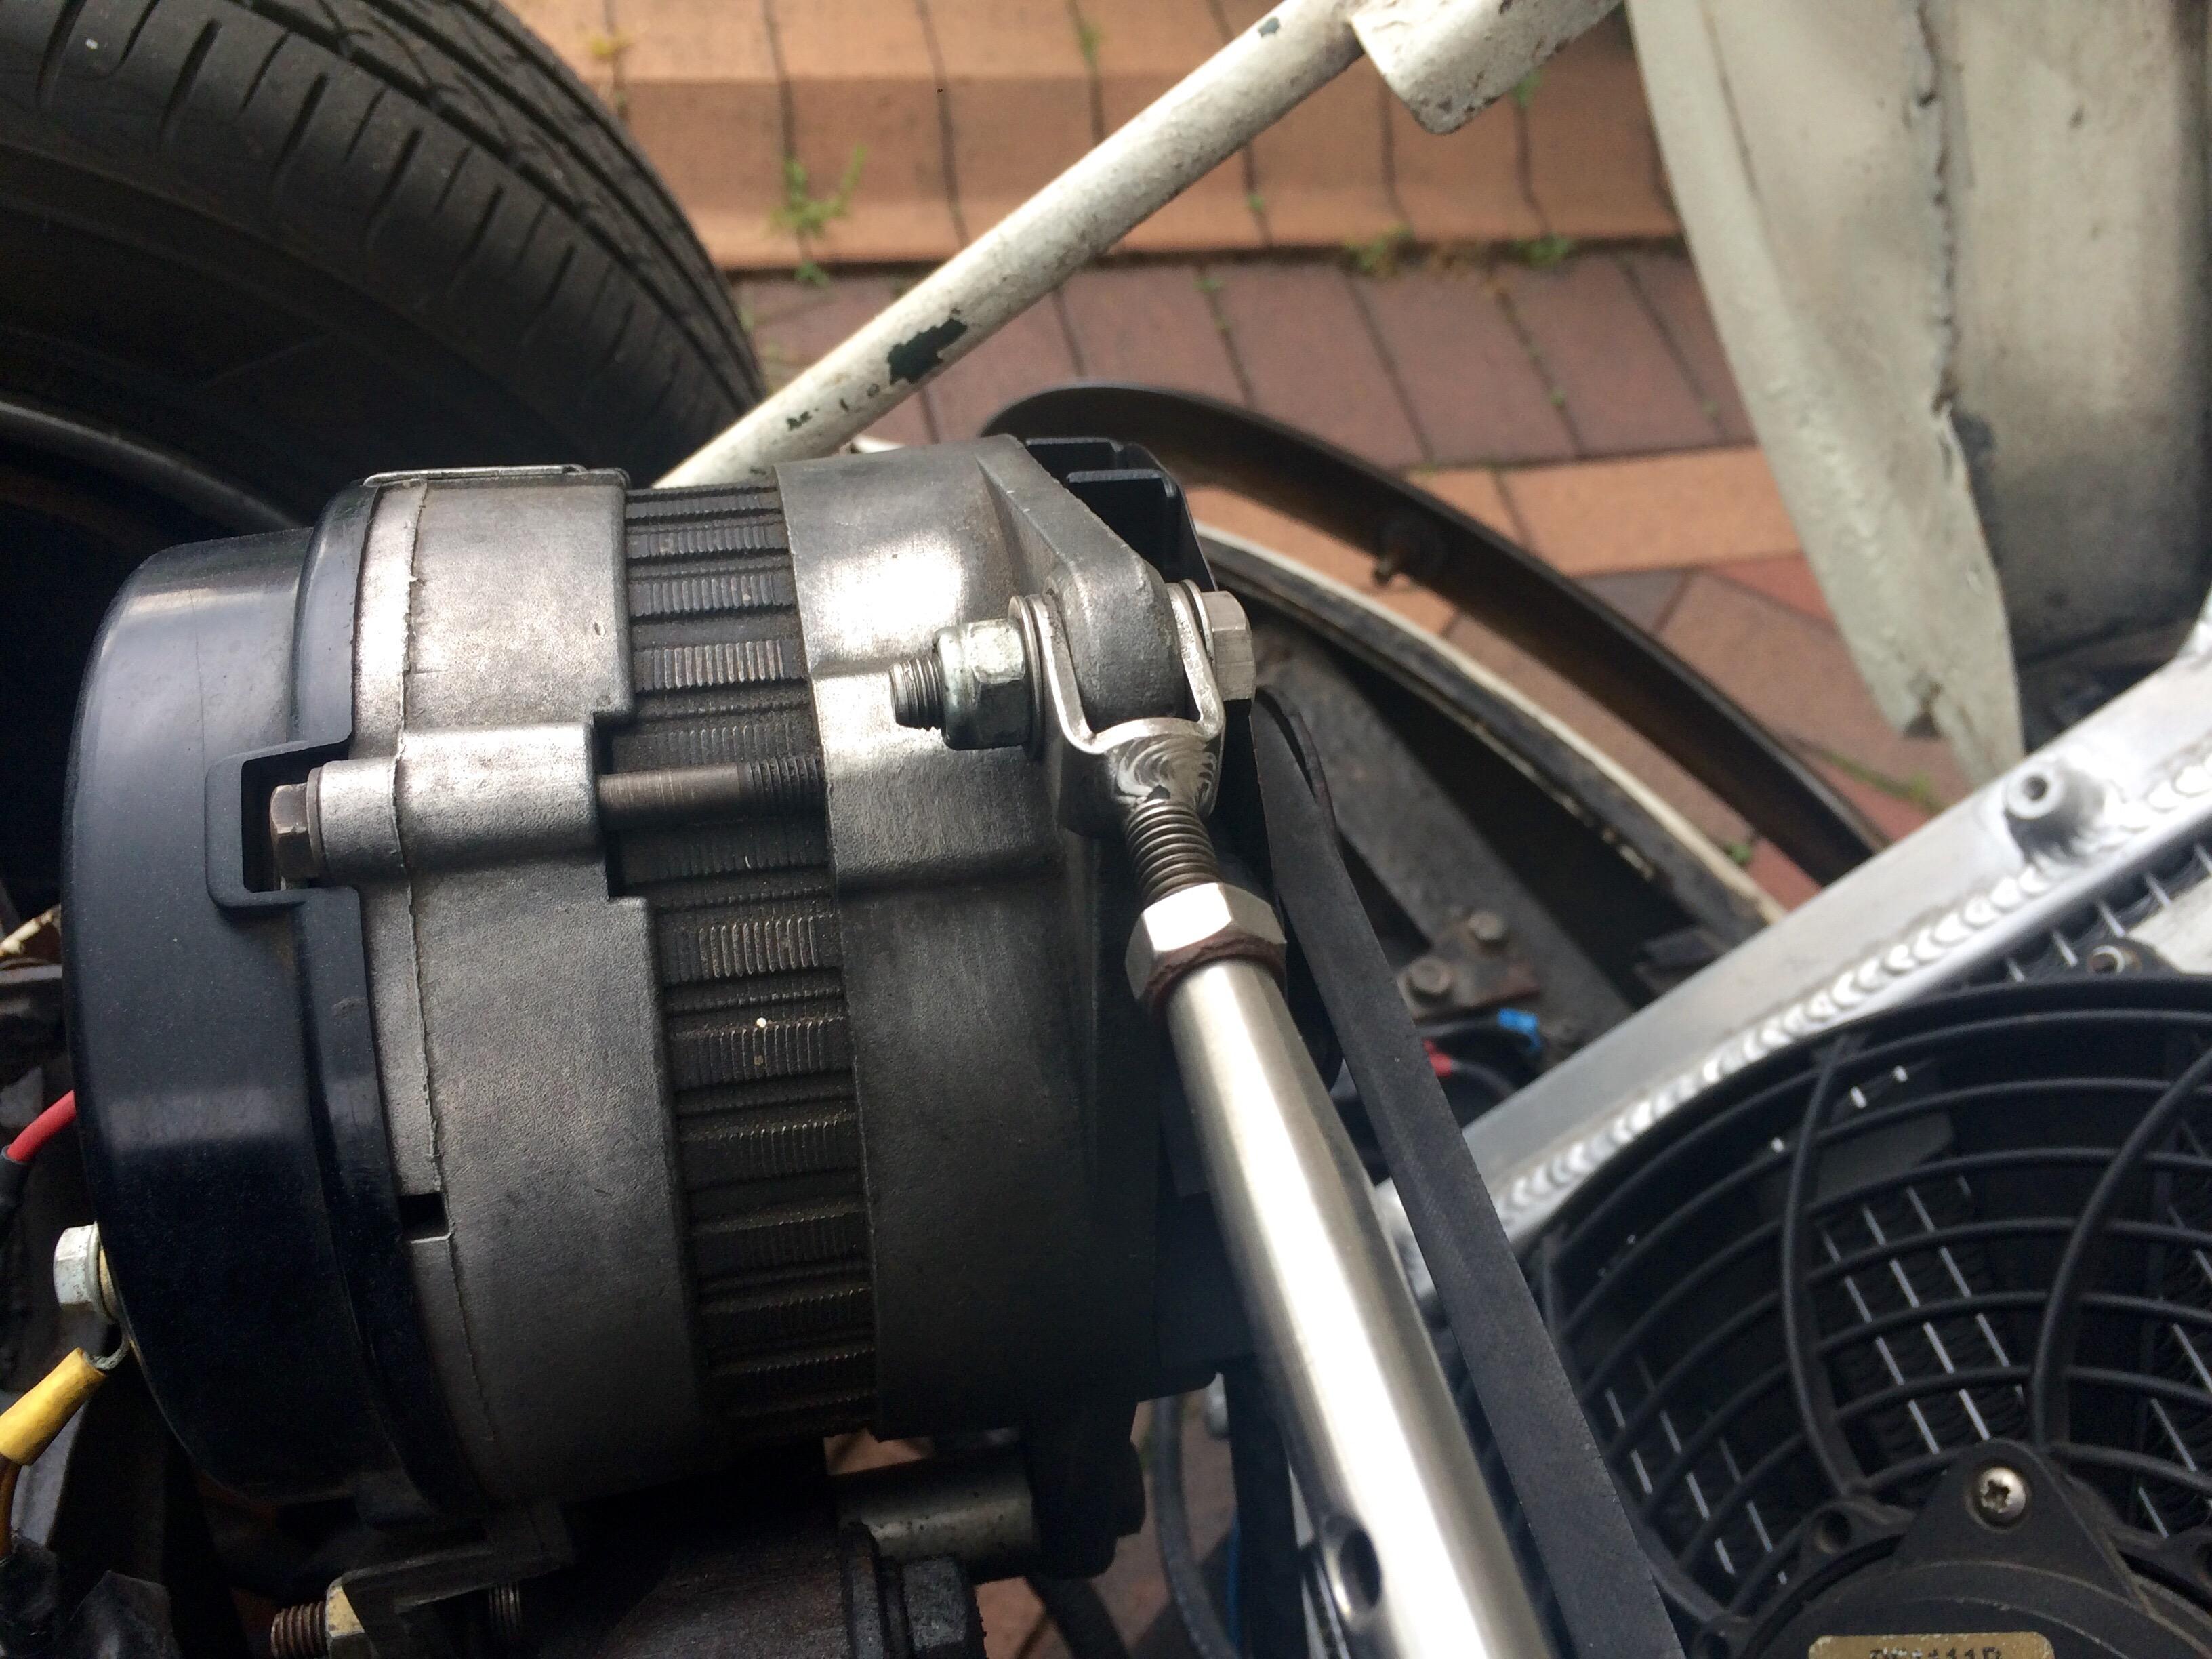 Gt6 Spitfire Diy Alternator Bracket Improvement My Quick Fix Re Conversion The